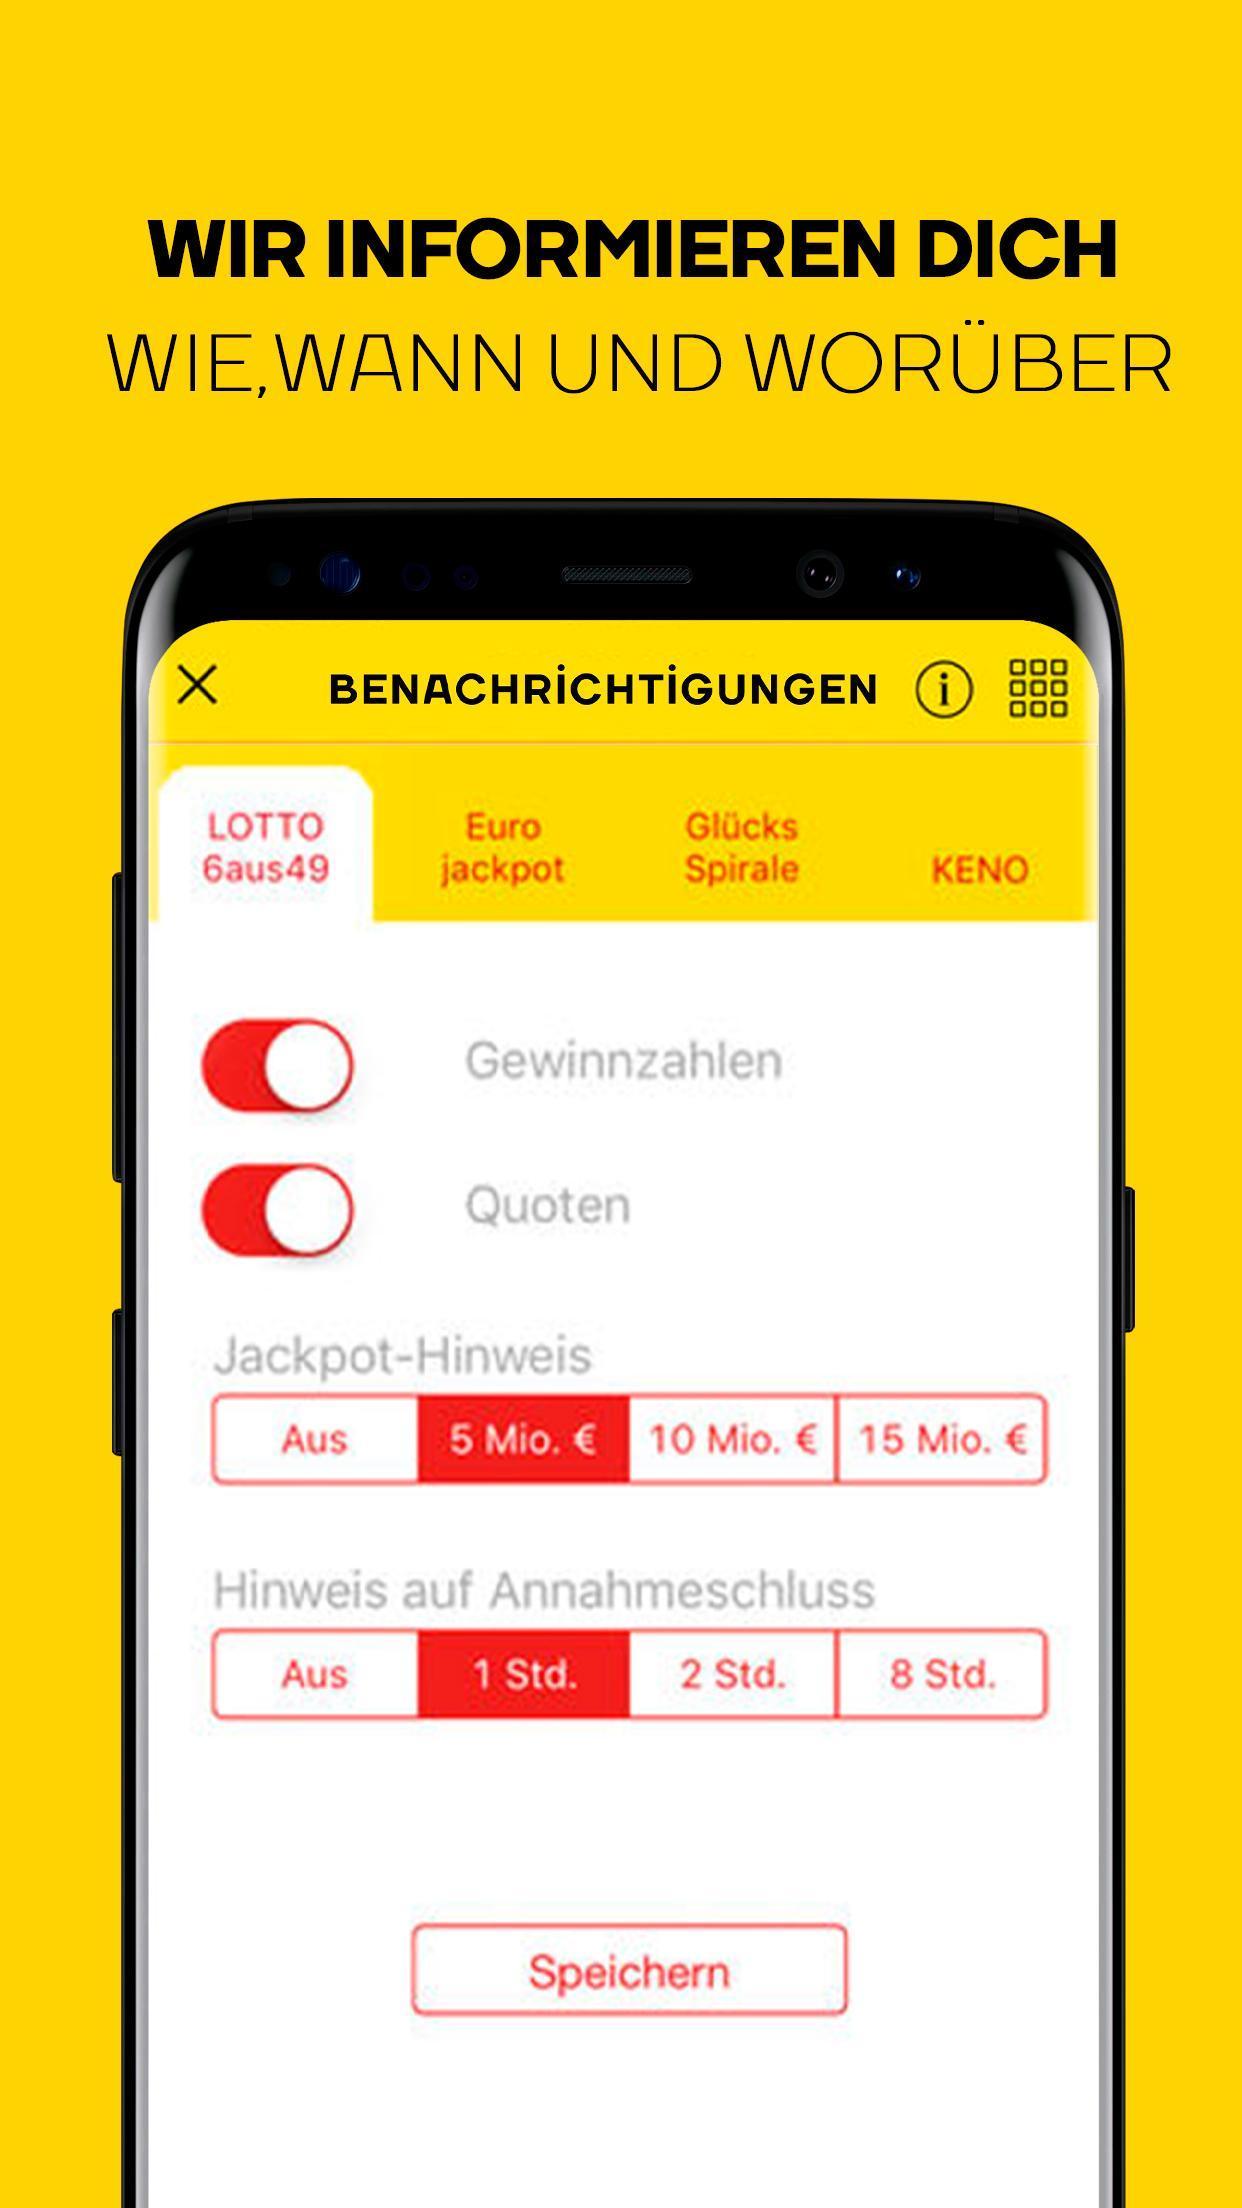 Lotto rhineland-palatinate, jogar na loteria online